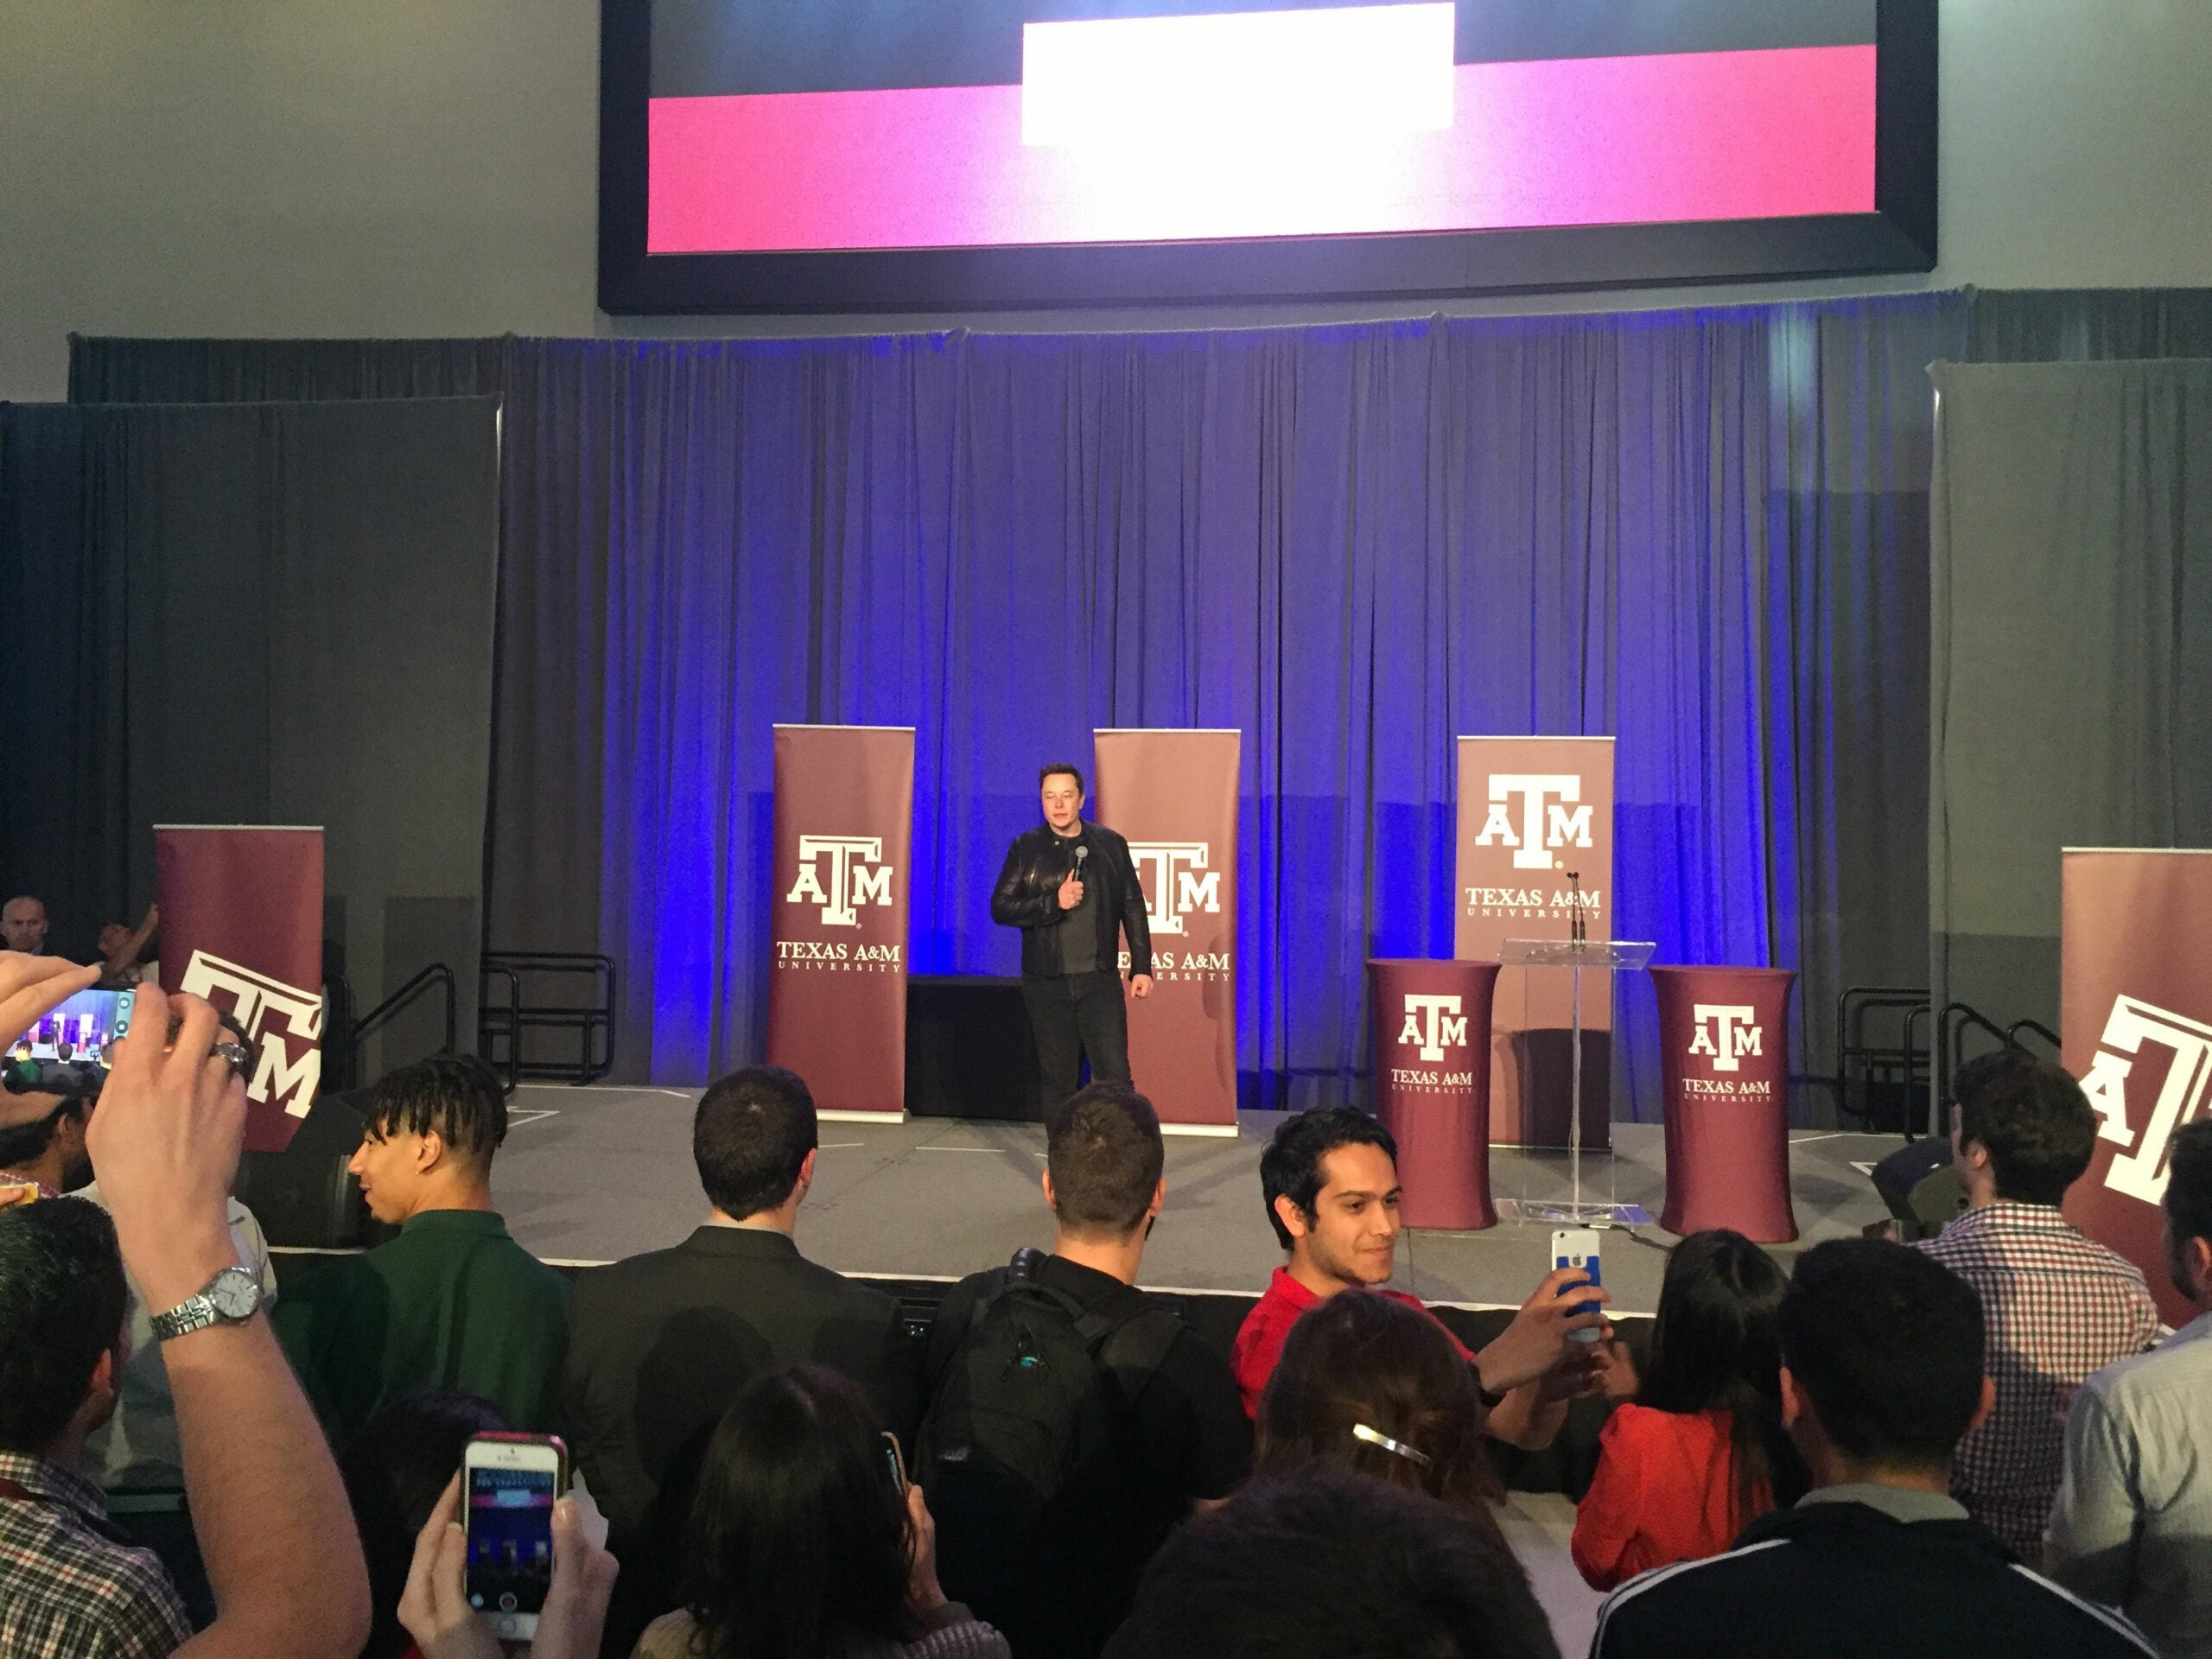 MIT Wins SpaceX's Hyperloop Pod Design Competition